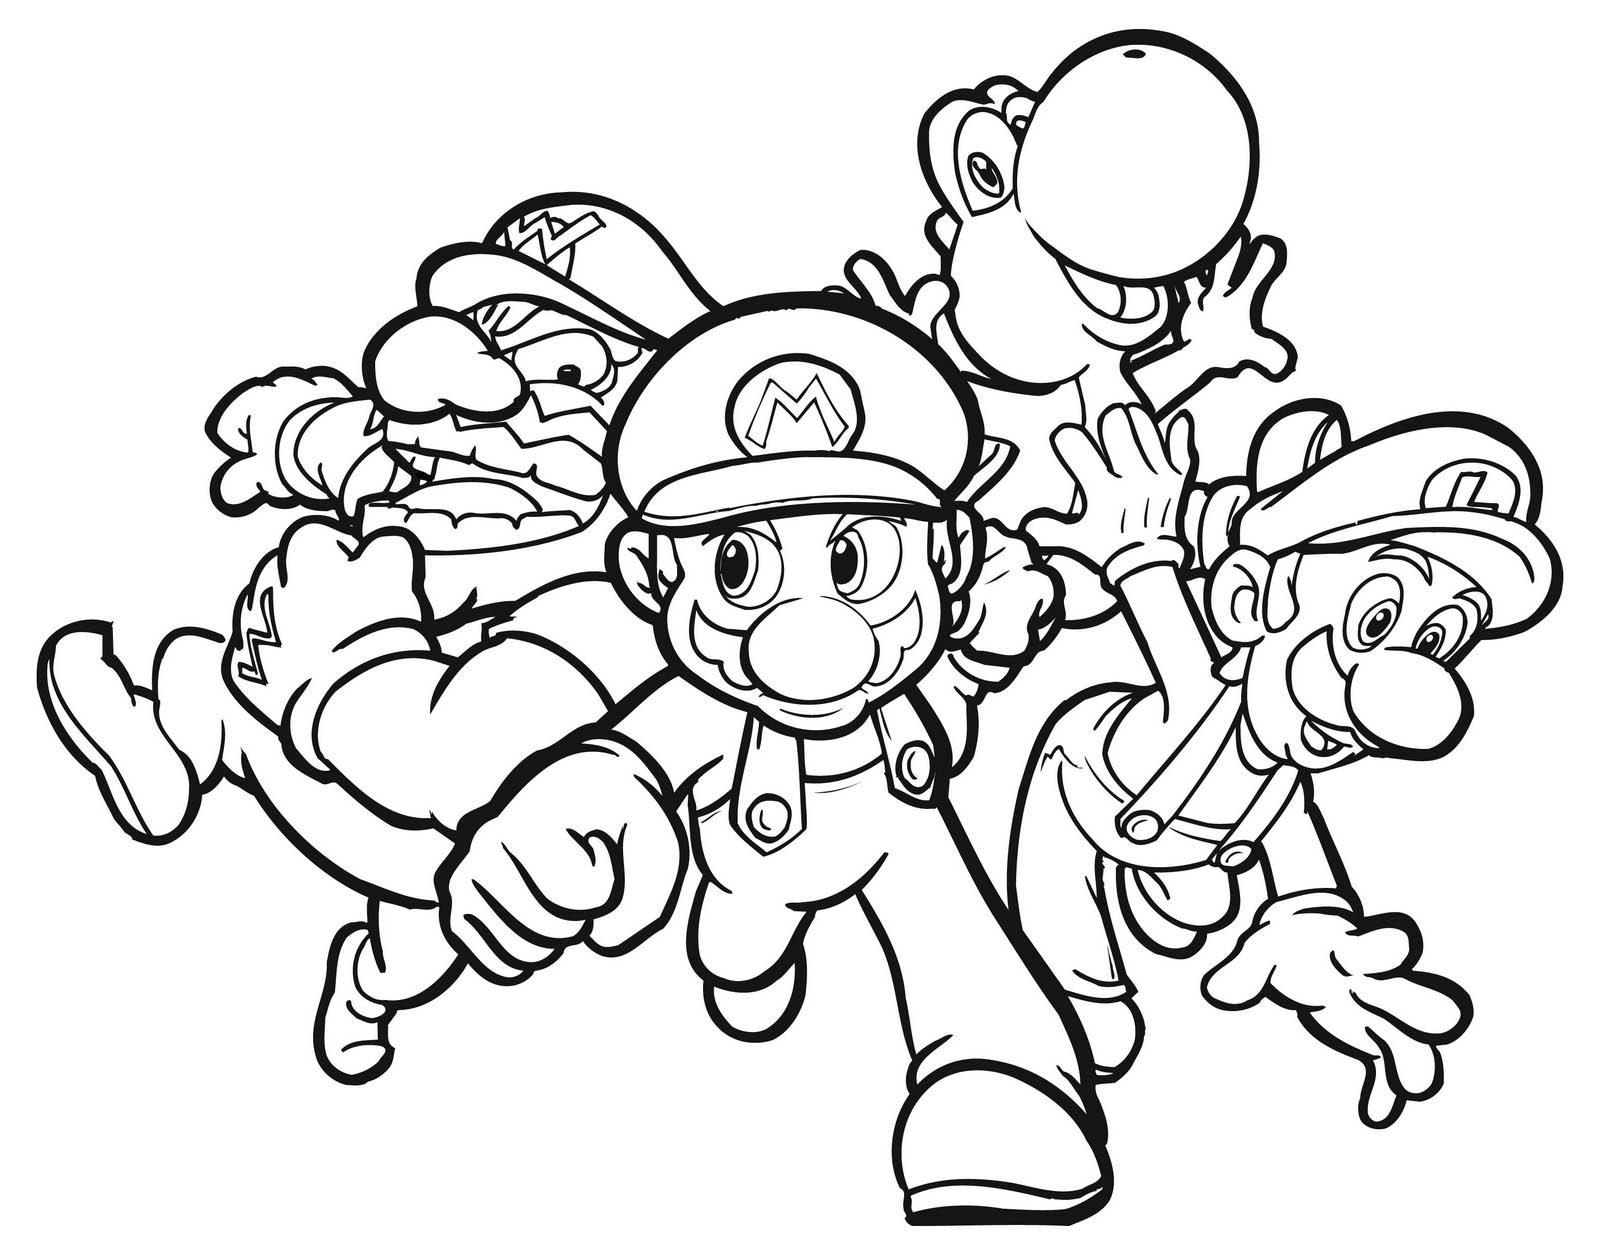 Super Mario Coloring Pages (5)